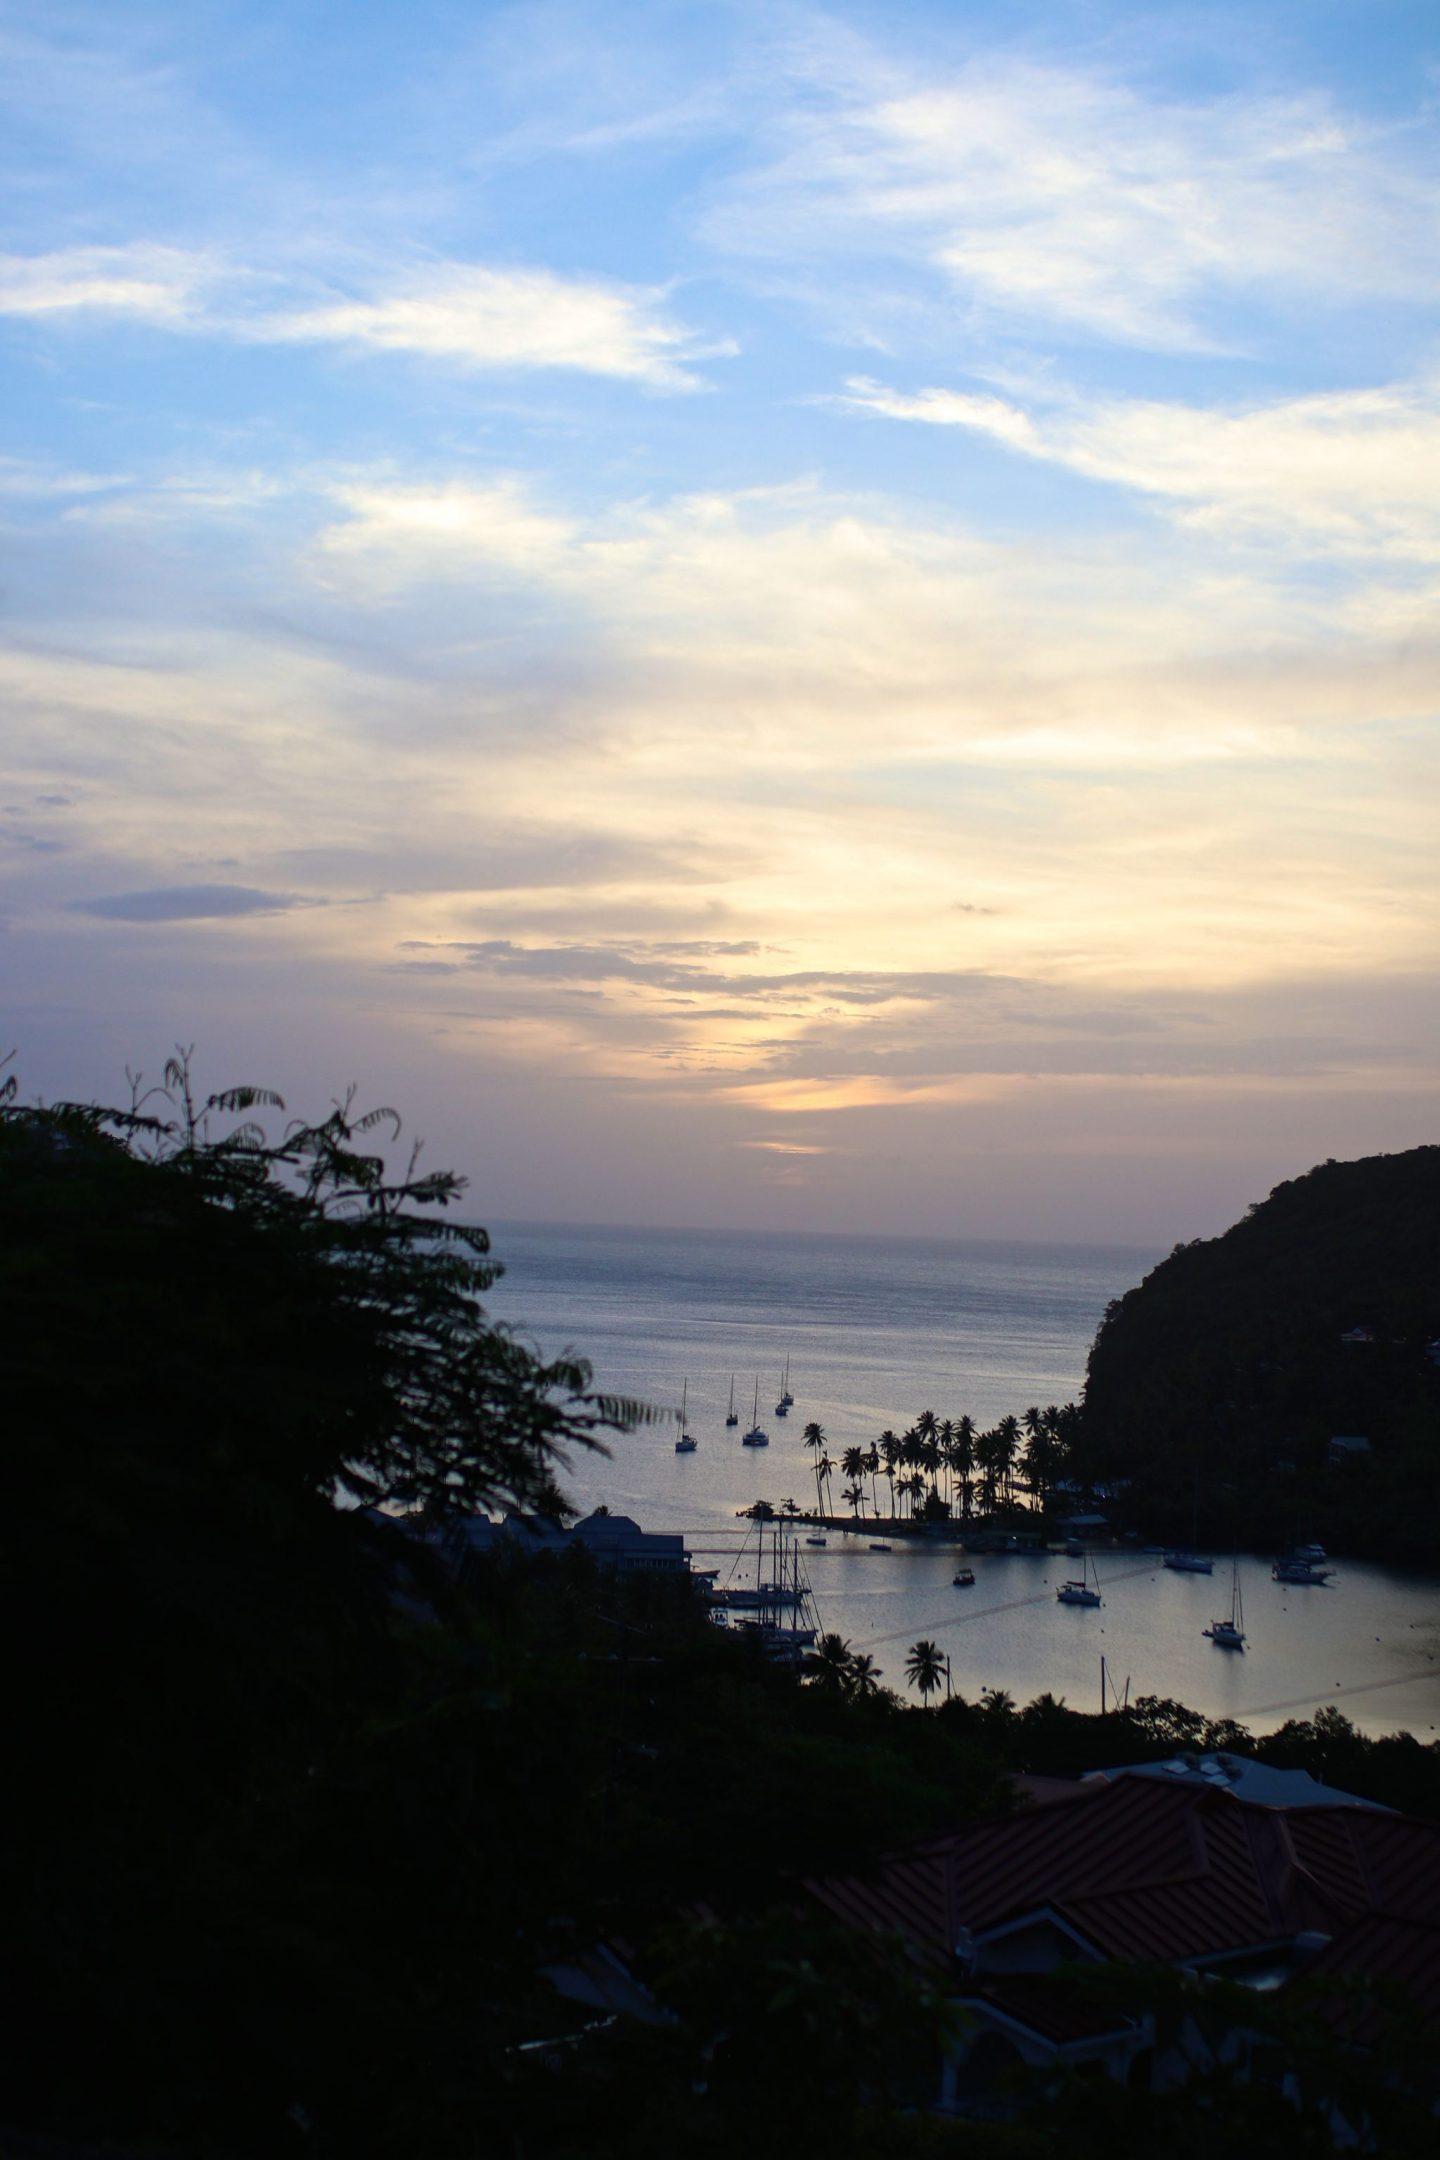 Katie KALANCHOE, St Lucia, Marigot Bay